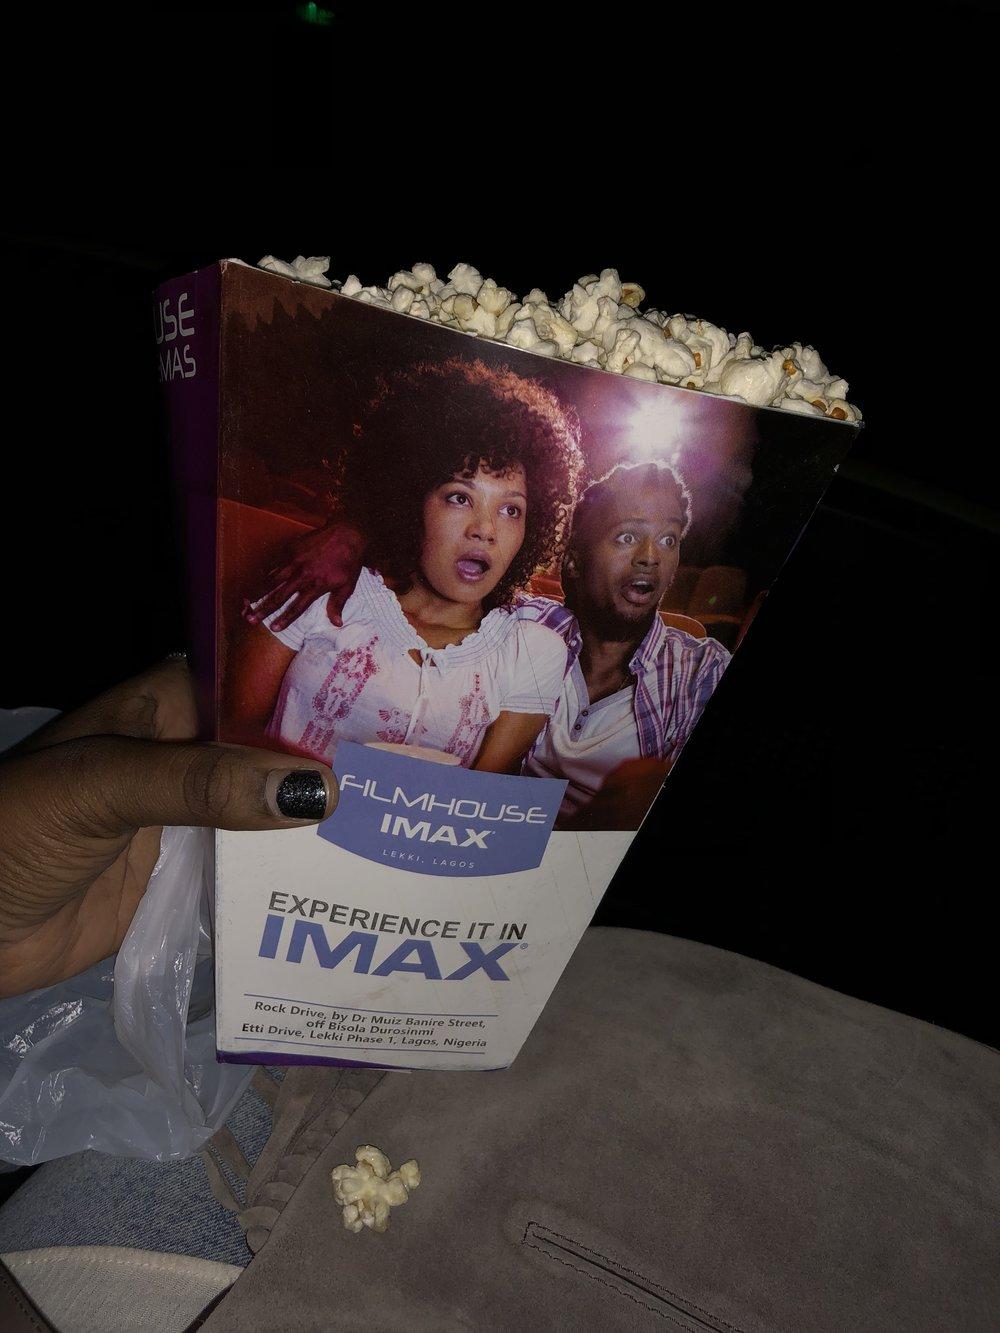 Filmhouse popcorn